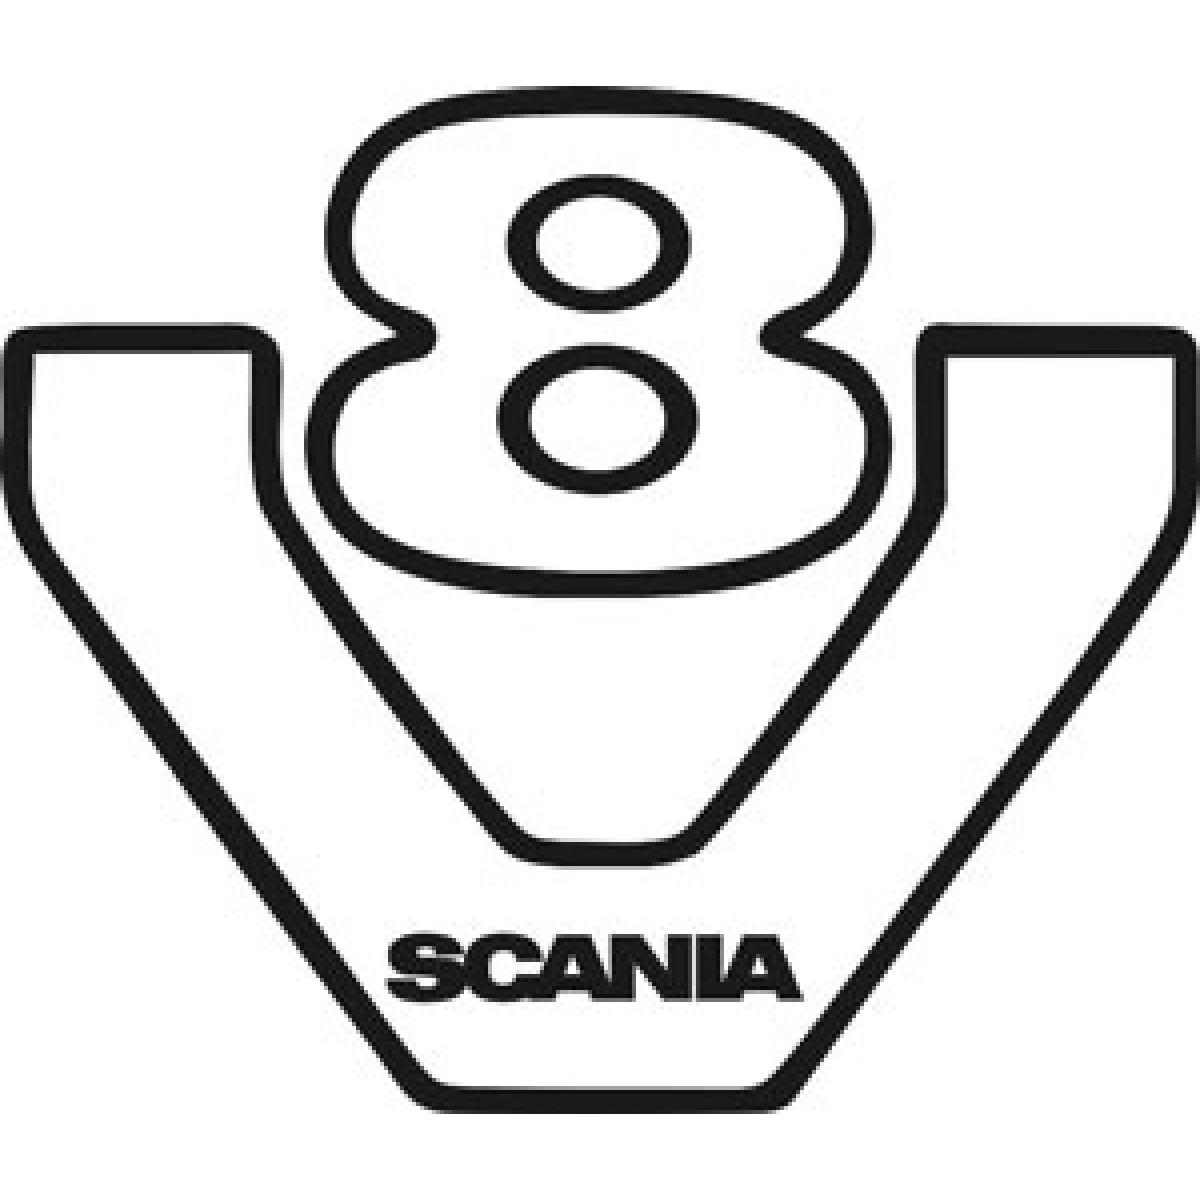 V8 Logos